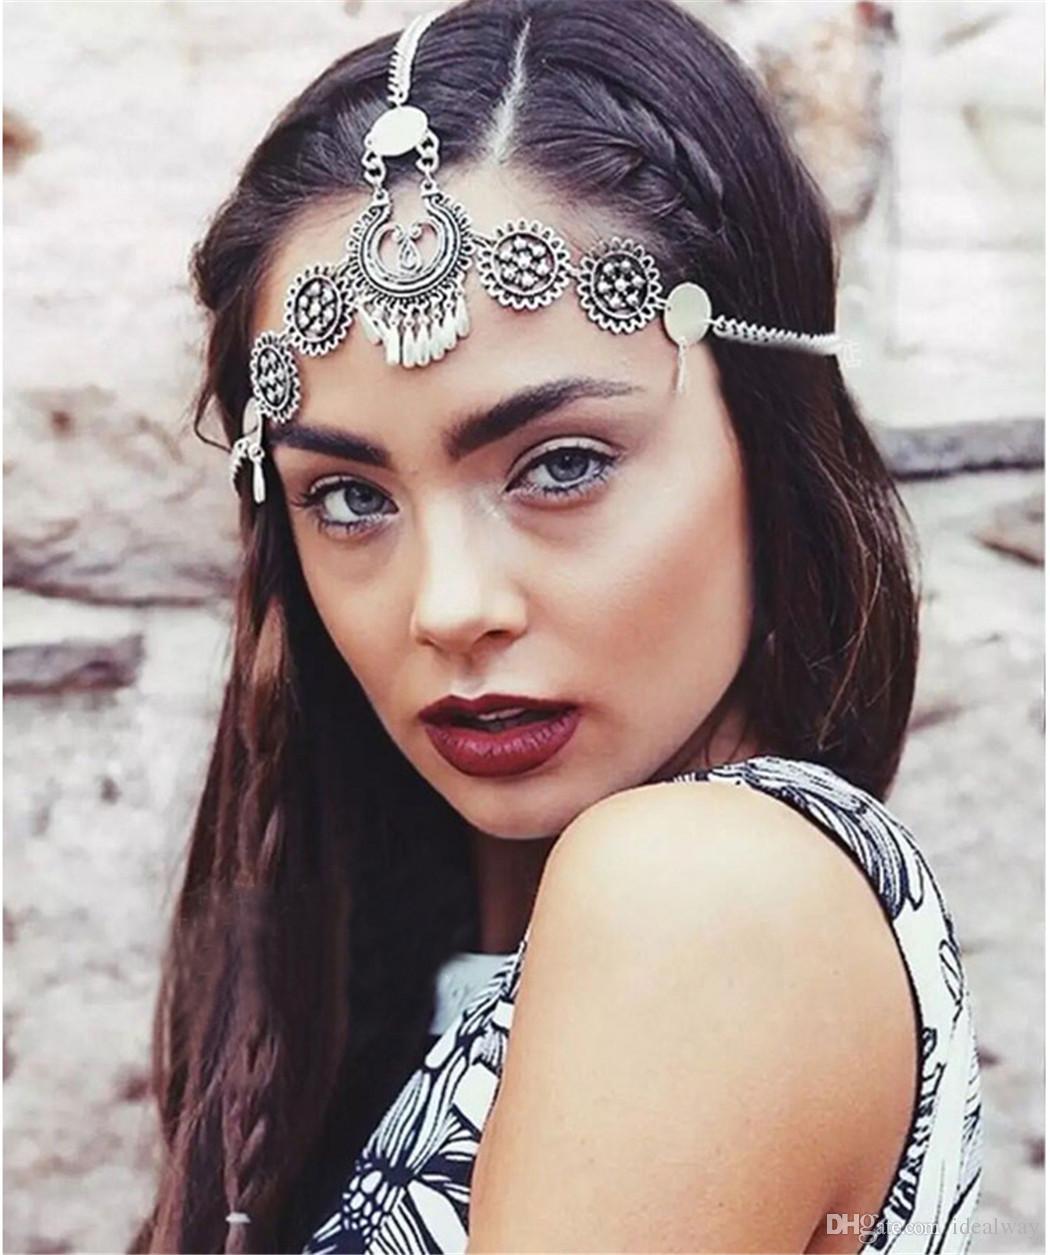 Bohemian vintage style silver metal hollow out flower headpiece headband ethnic head chain headwear hair jewelry